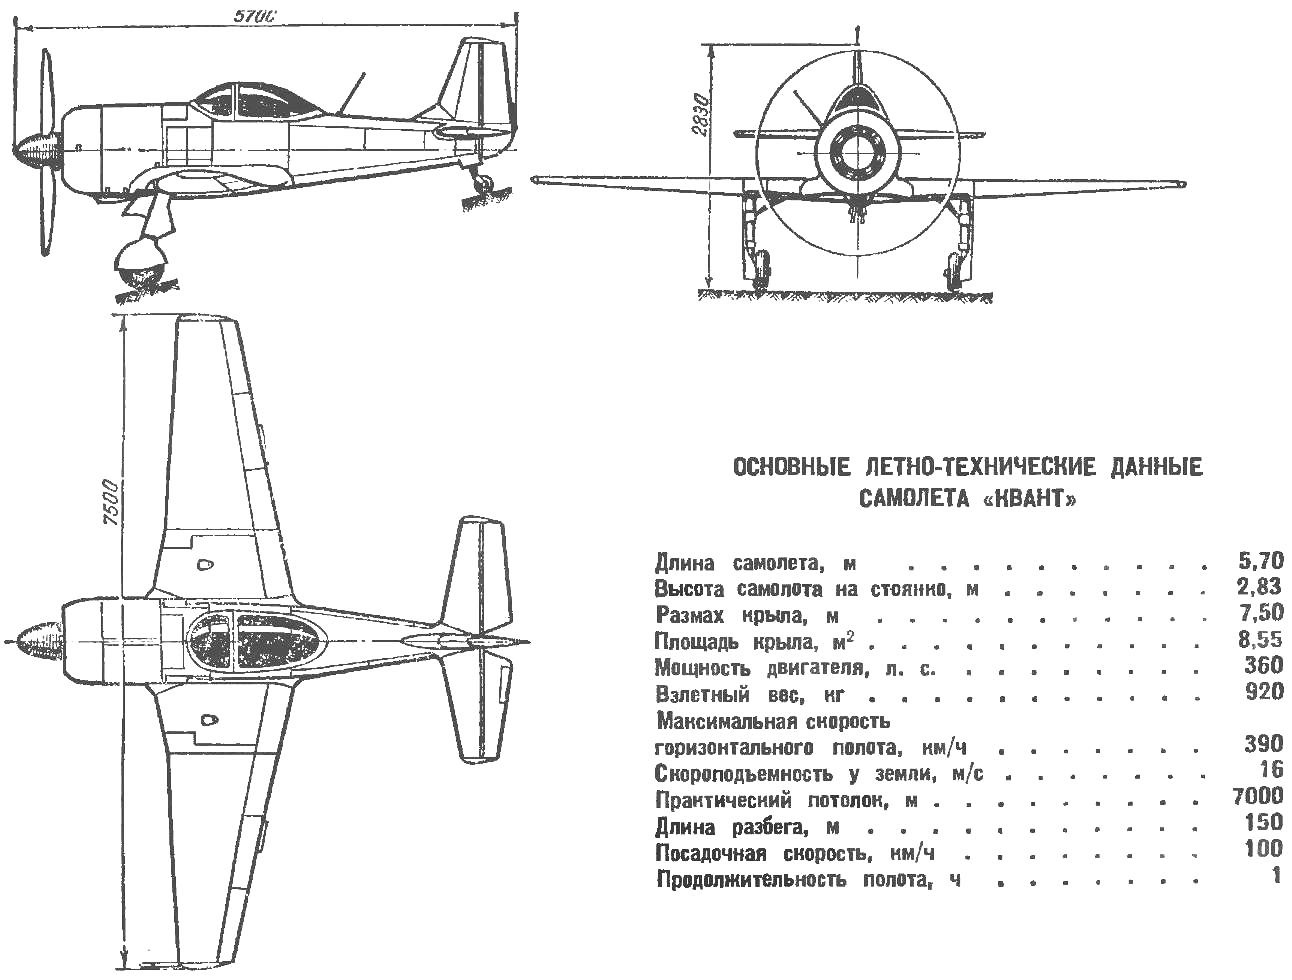 Рис. 1. Самолет «Квант»